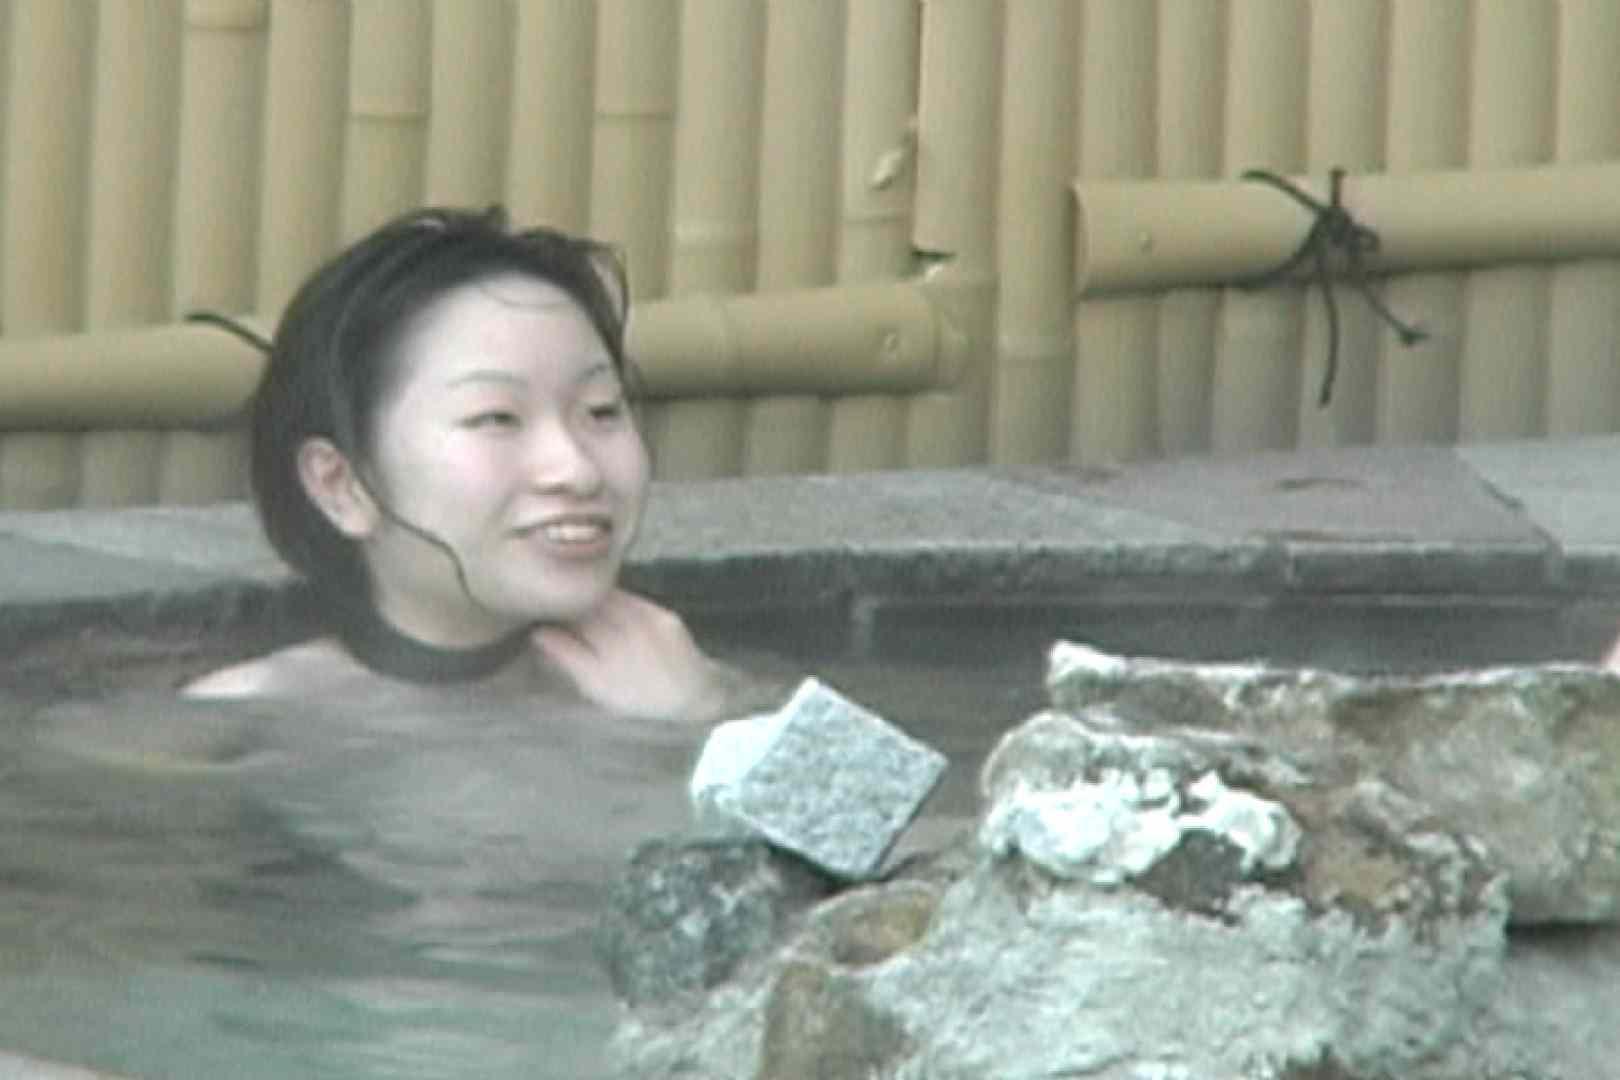 Aquaな露天風呂Vol.595 HなOL | 露天  65pic 60